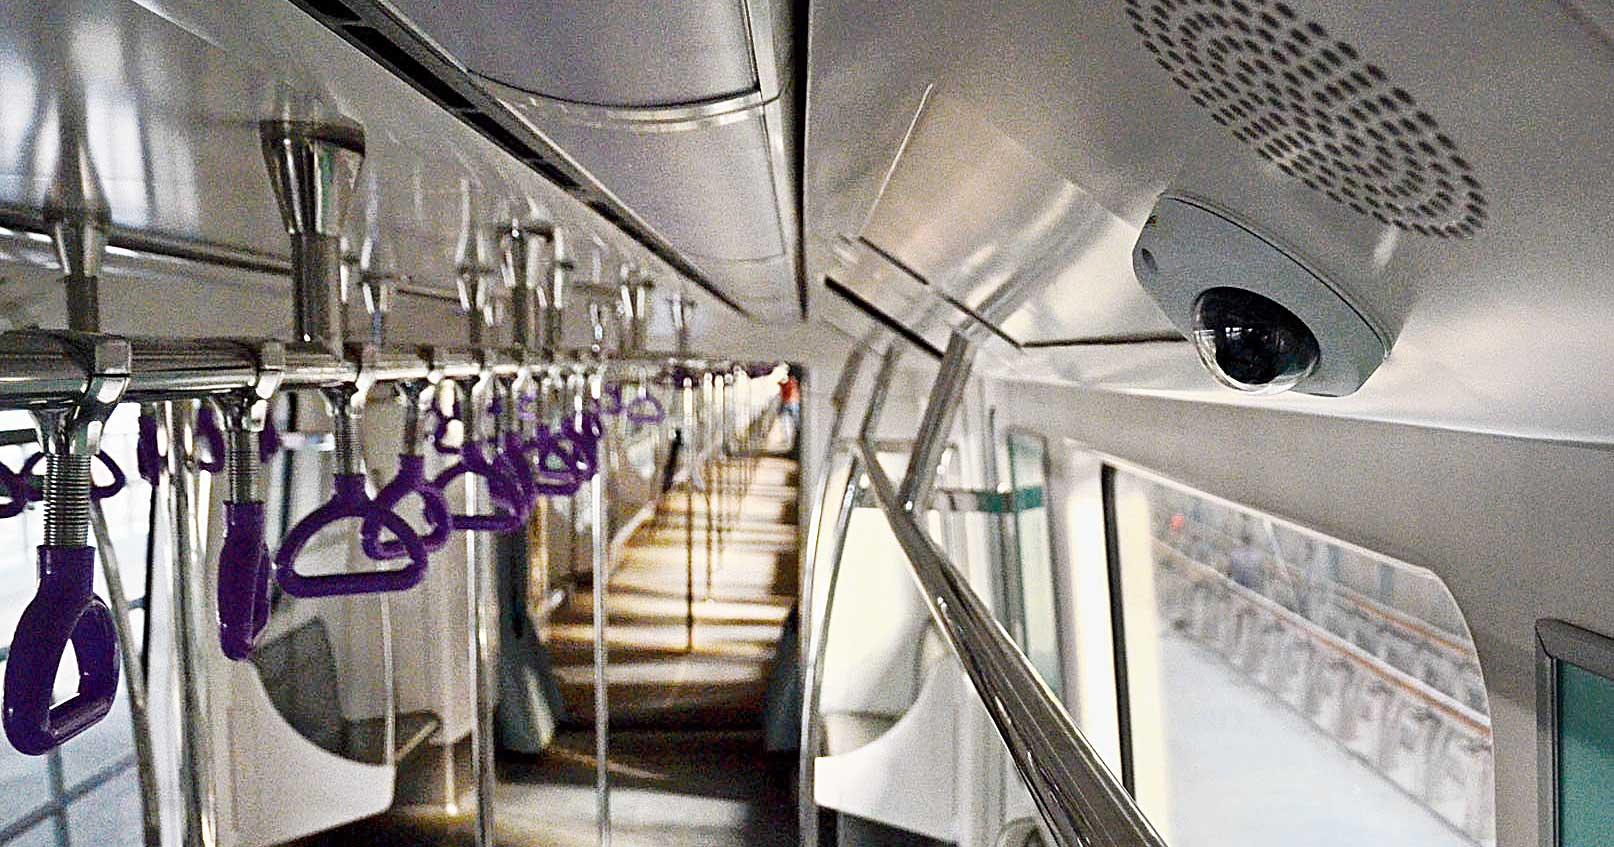 A CCTV camera inside an East-West Metro rake